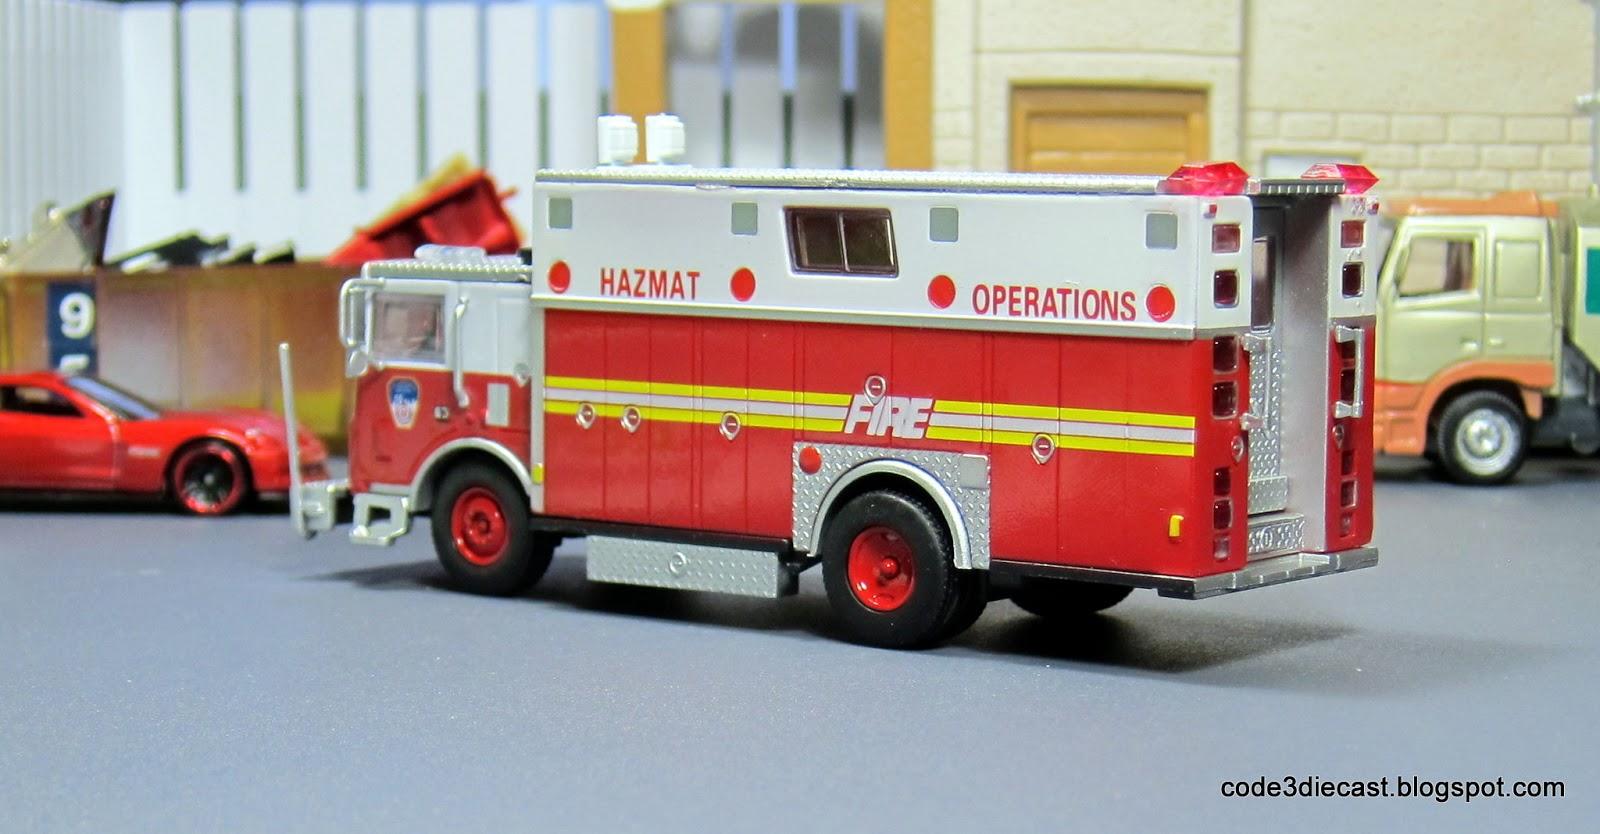 My Code 3 Diecast Fire Truck Collection Mack Hazmat